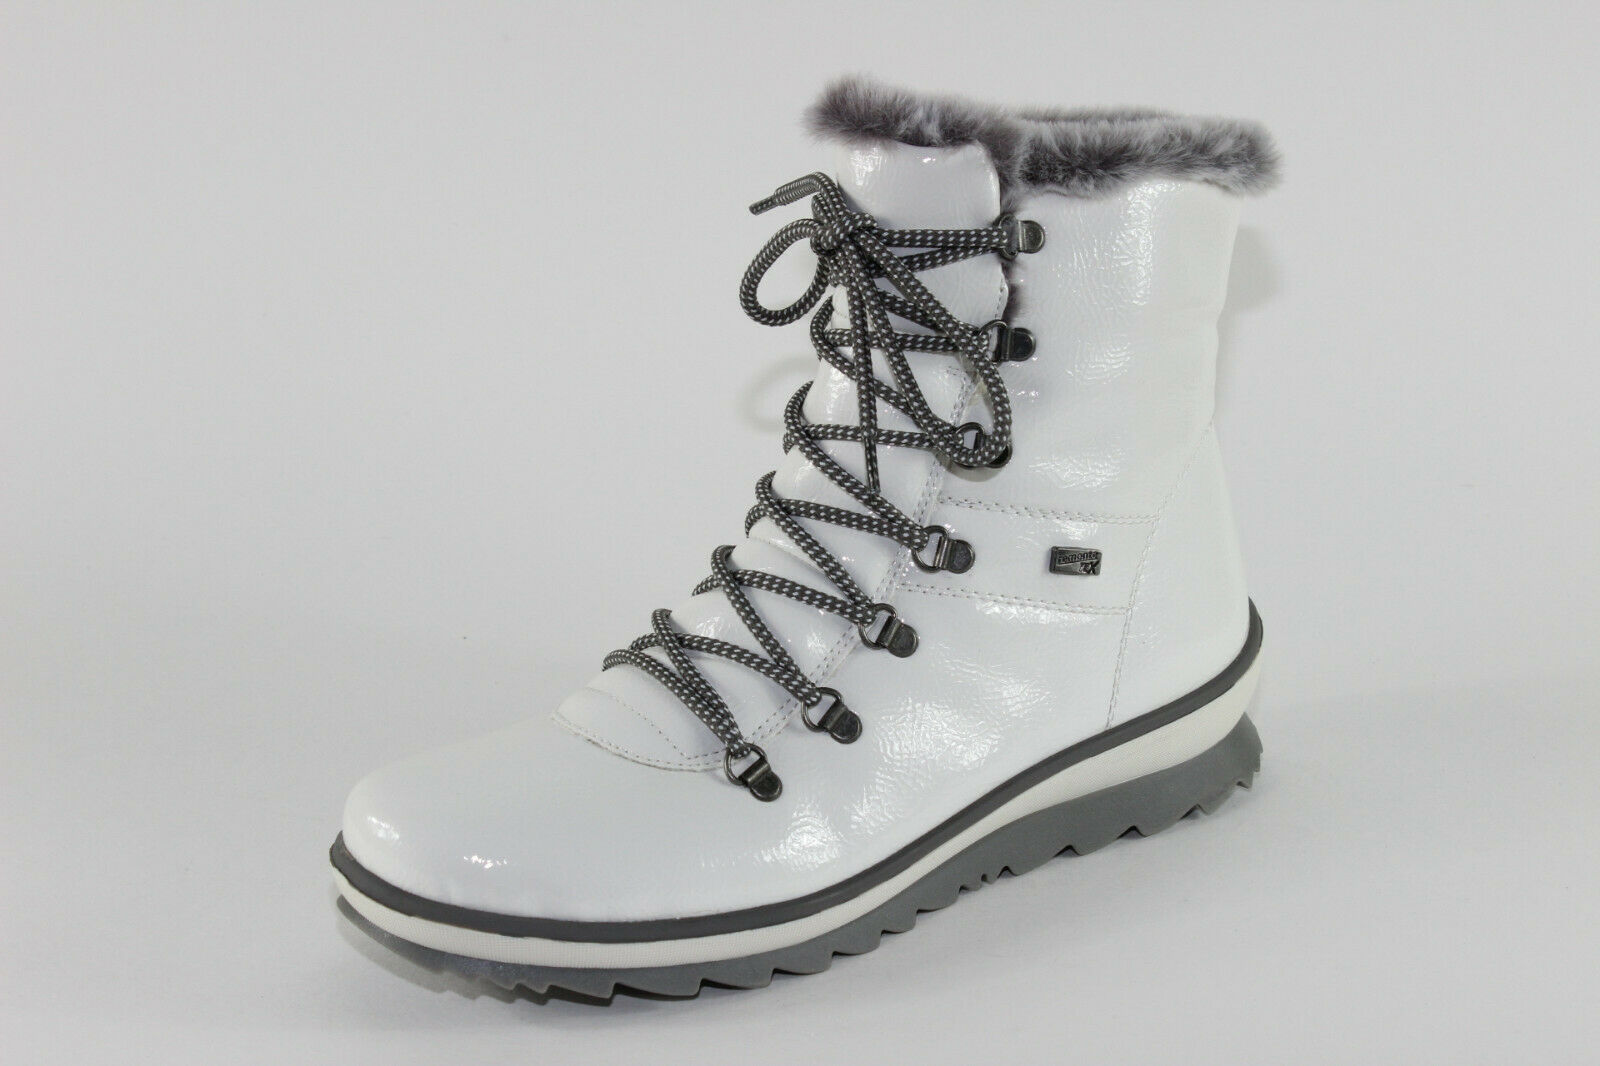 Remonte R8472 80, Winter Stiefel mit Tex Membran